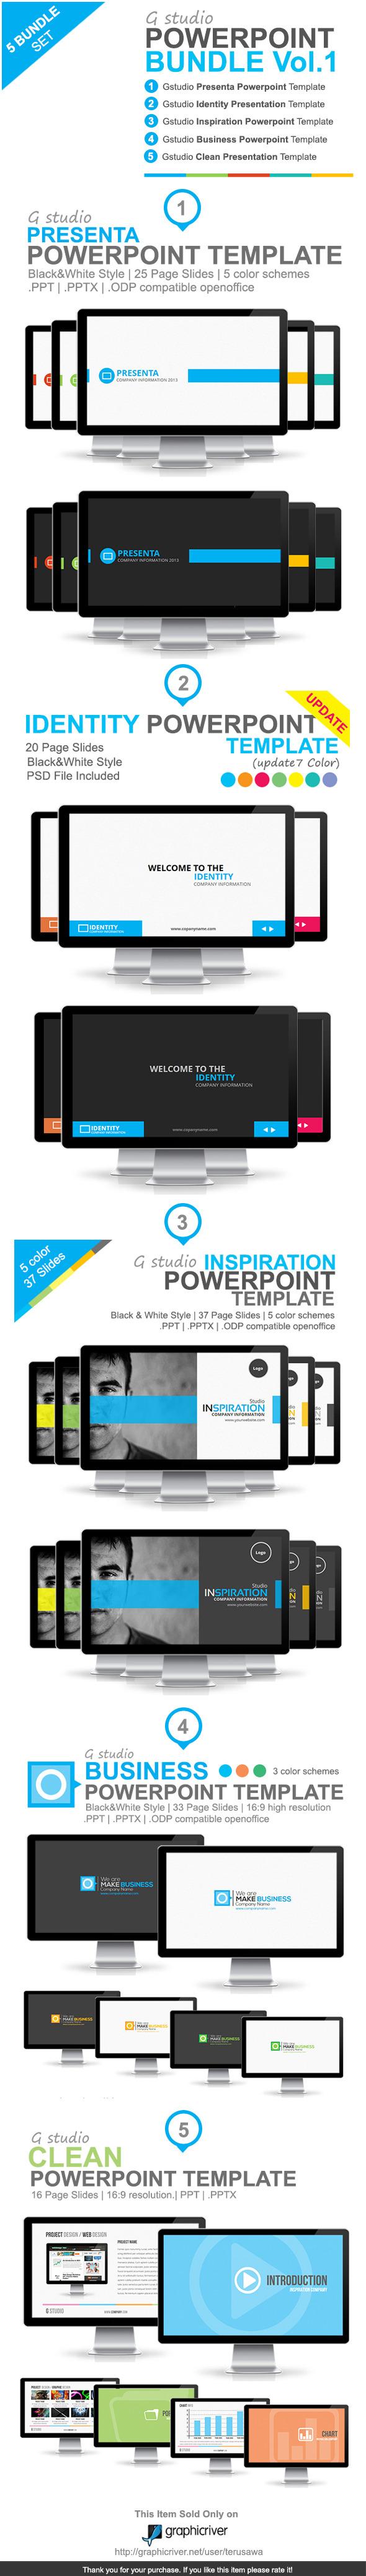 Gstudio Powerpoint Bundle Vol.1